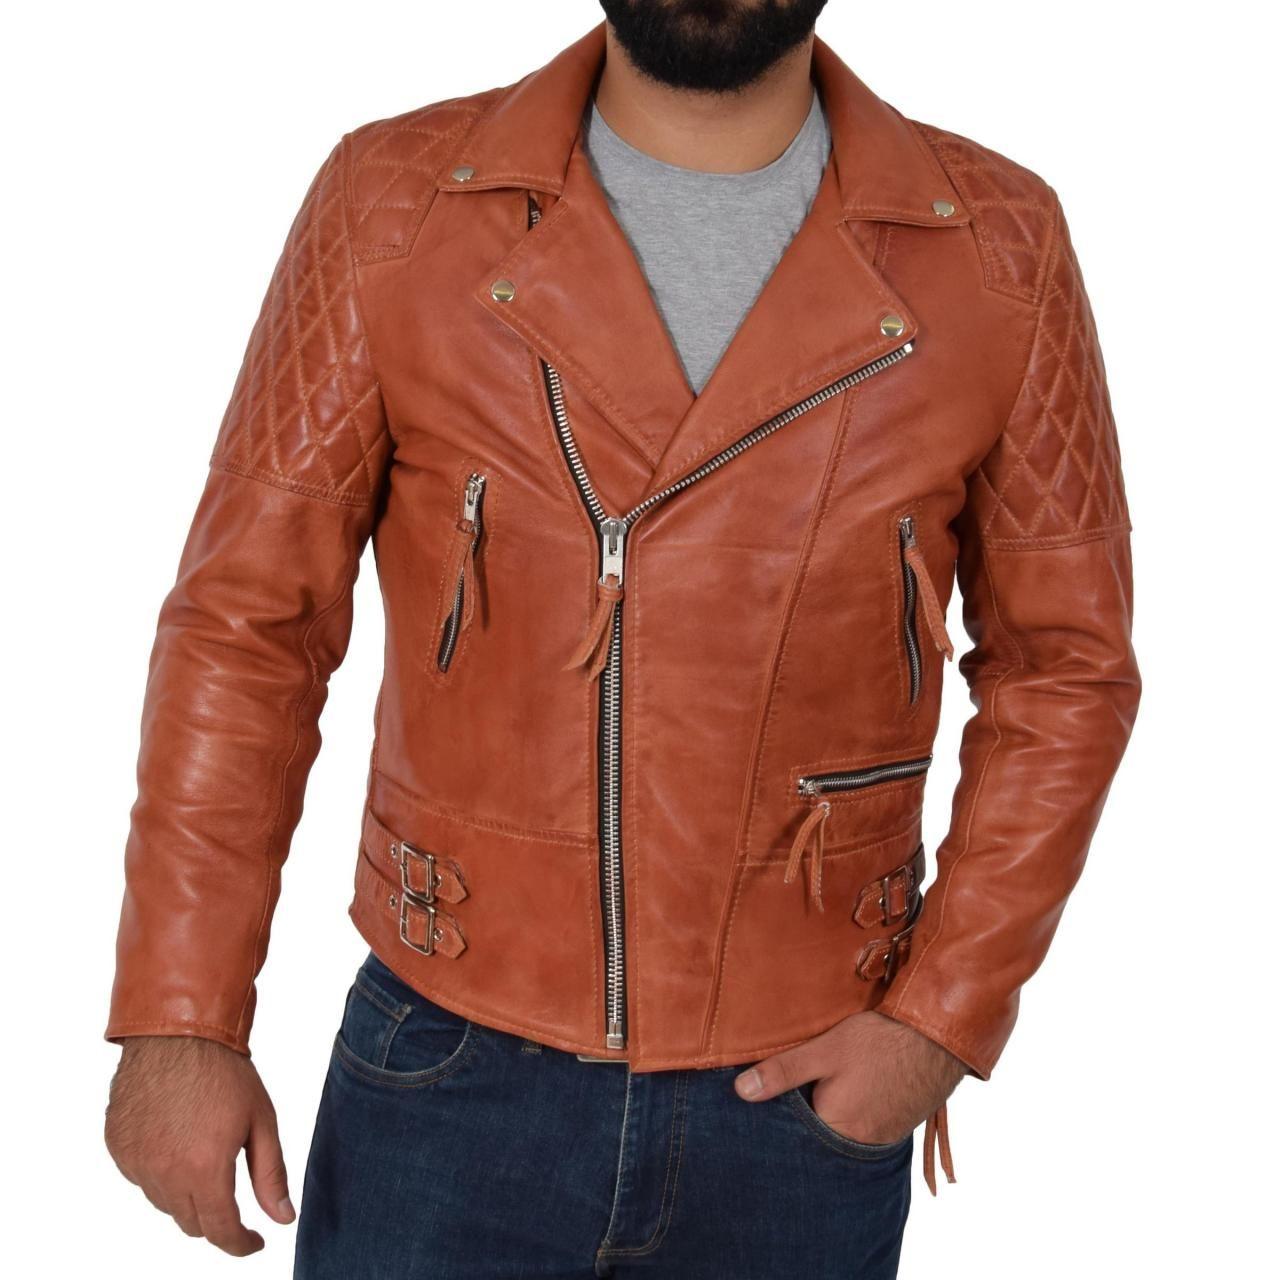 Mens Cross Zip Biker Leather Jacket Cognac Tan, Fashion